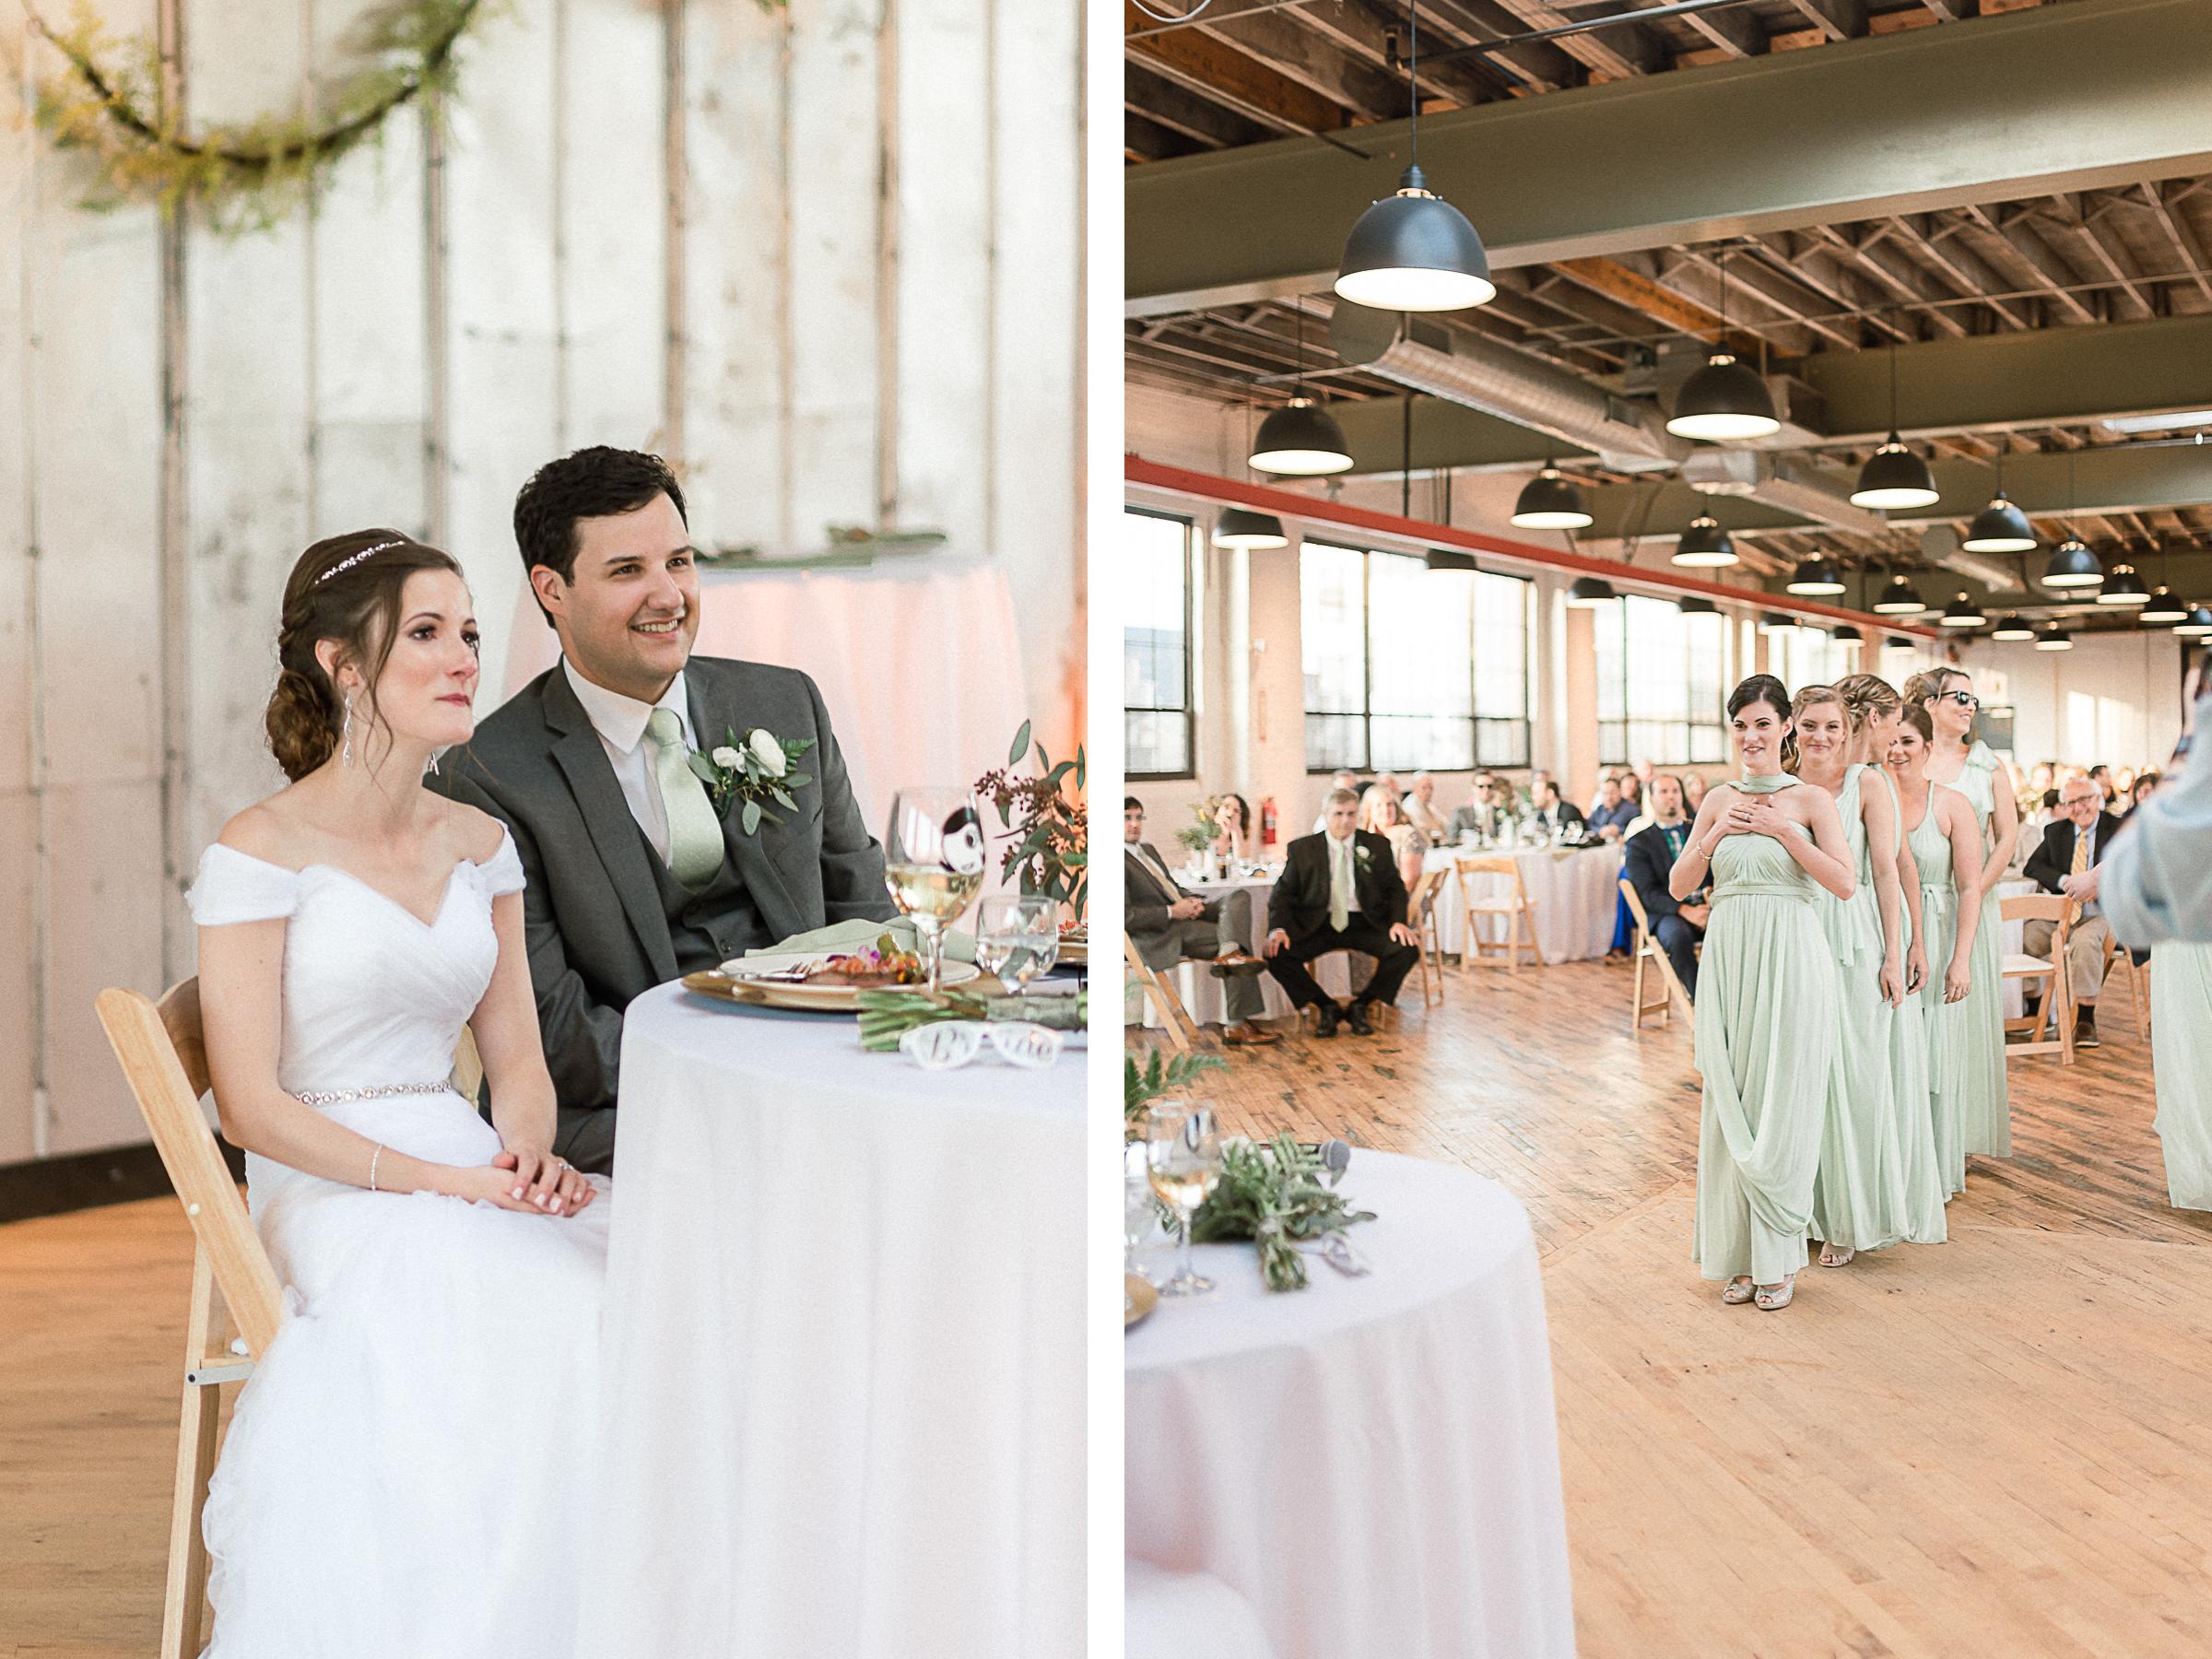 MD-Baltimore-Wedding-Accelerator-Space-Greenery-91.jpg